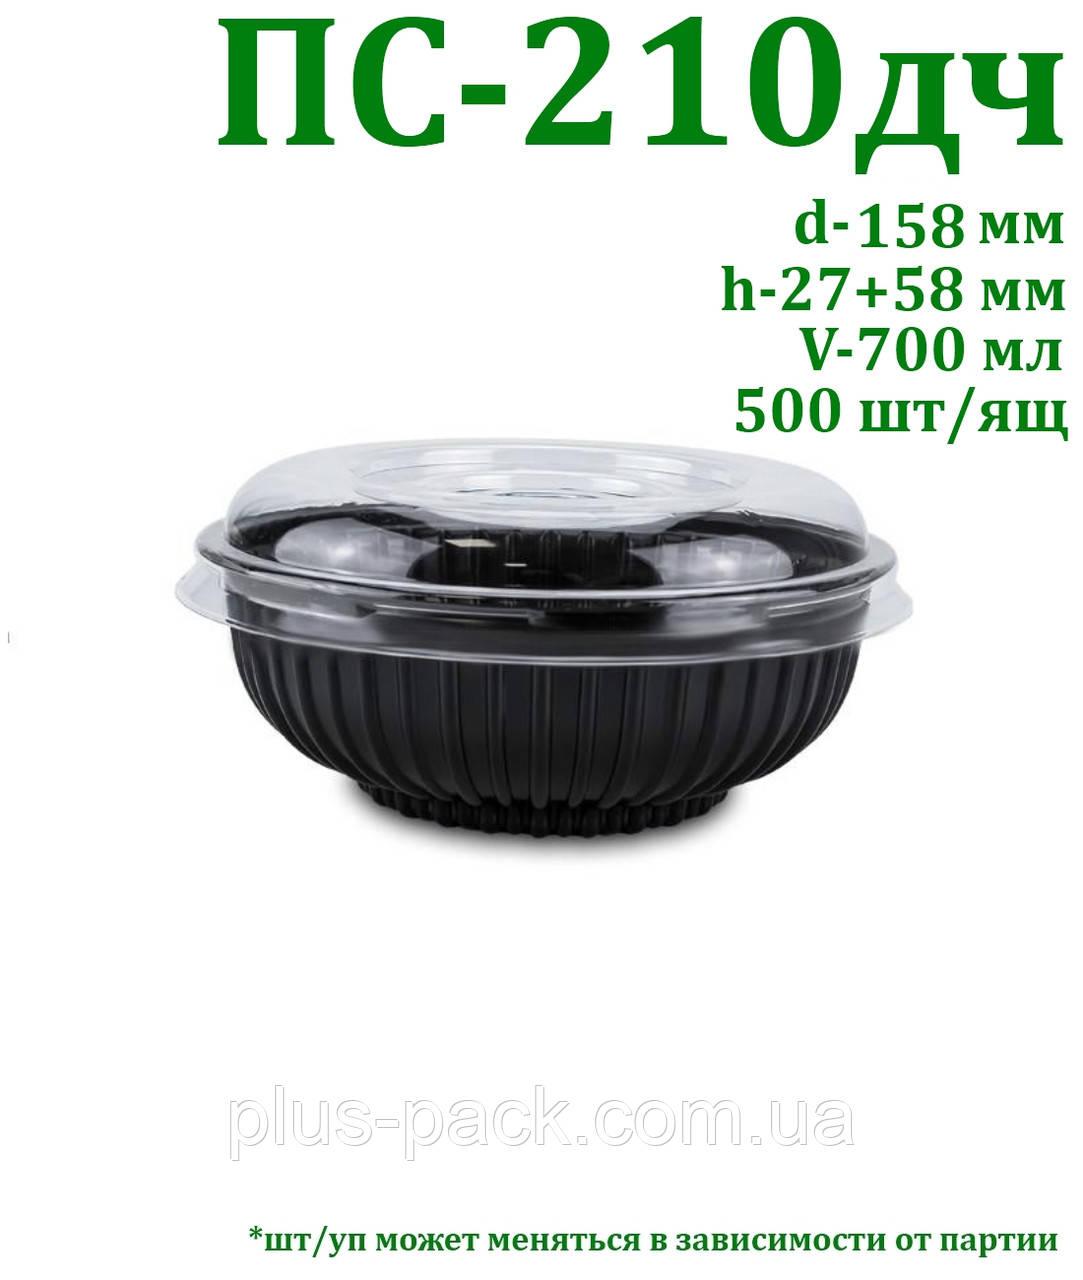 Упаковка для салата ПС-210 дч (700 мл), круглая, одноразовая